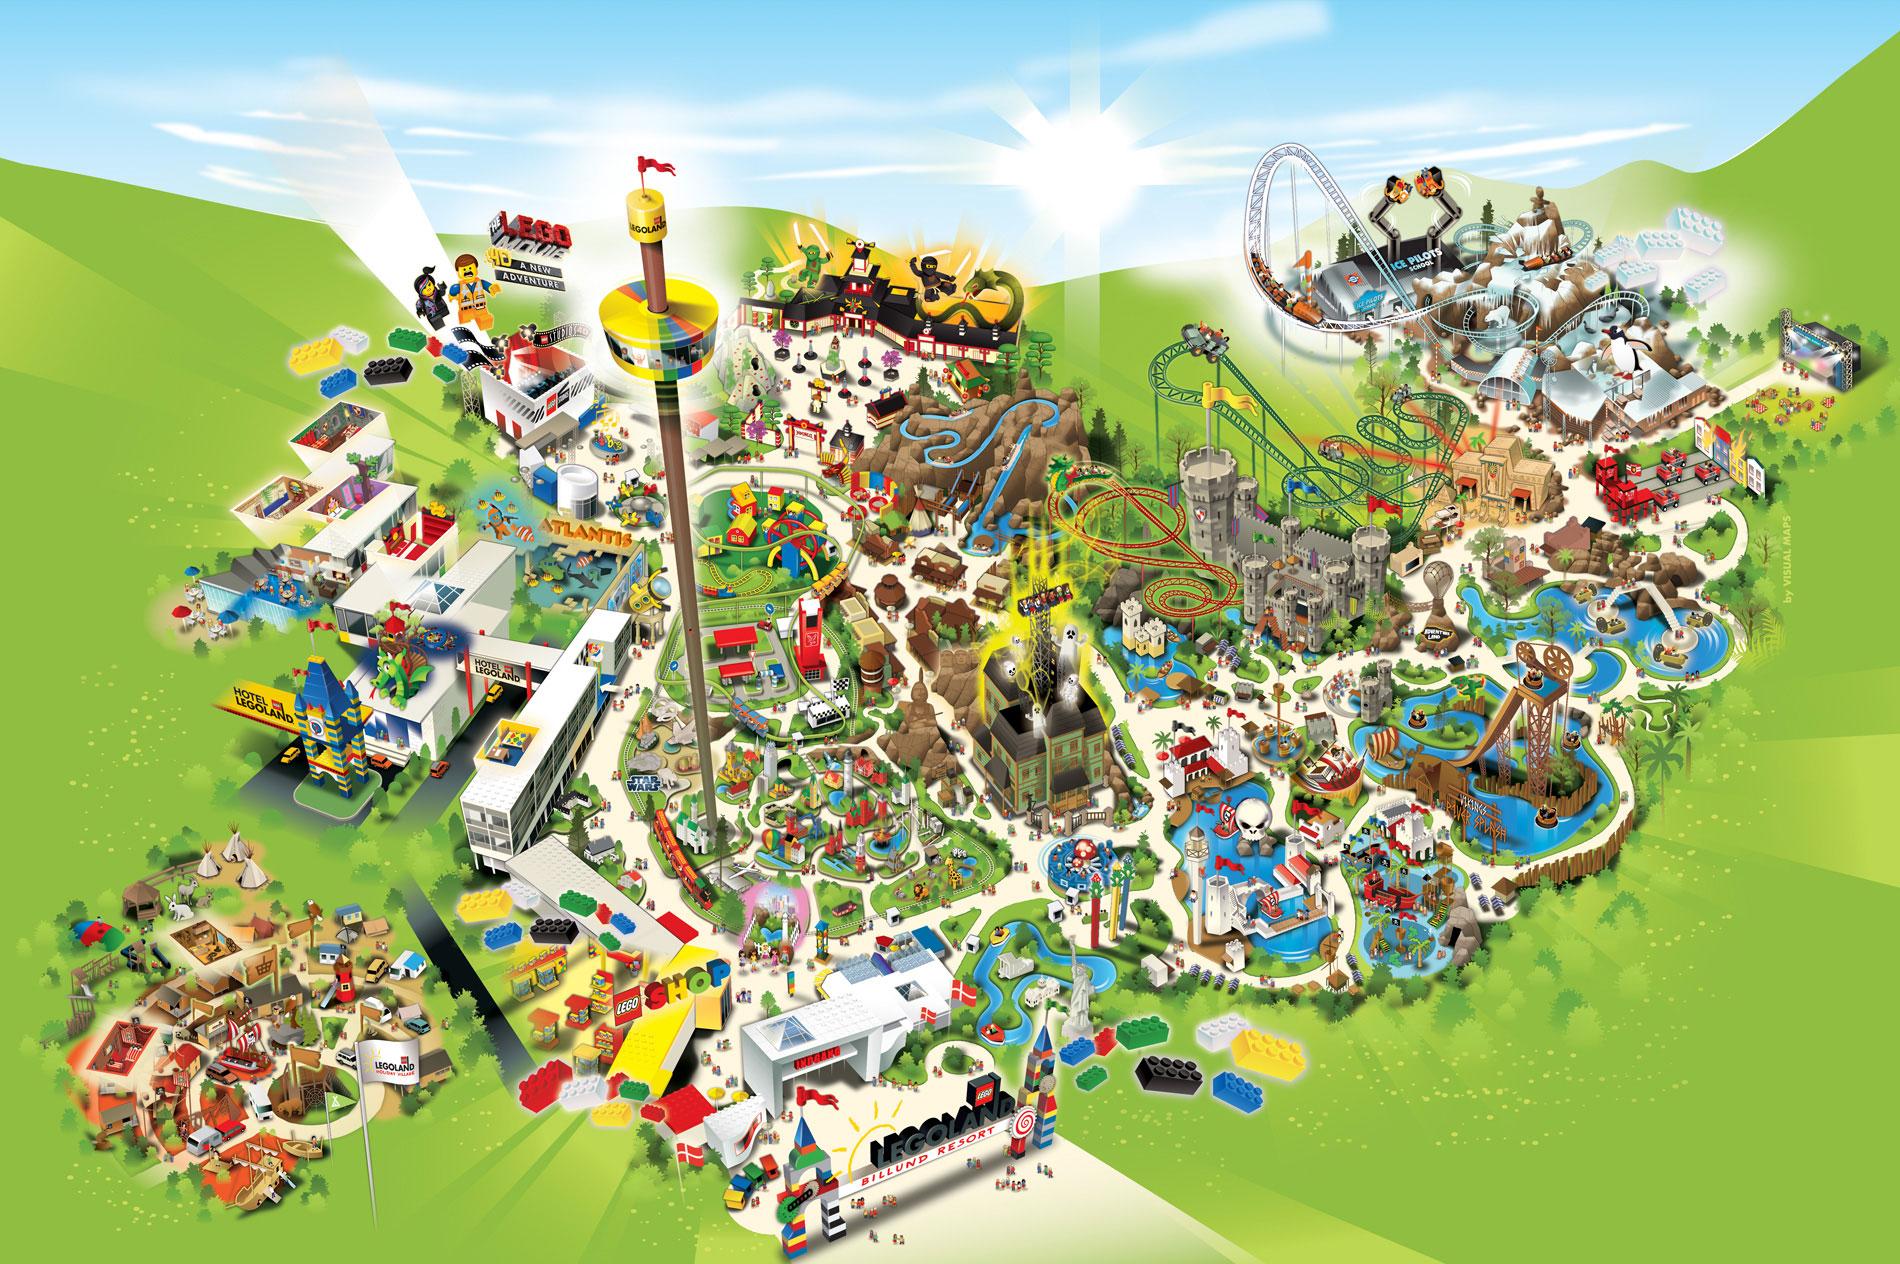 Legoland Billund 100tour